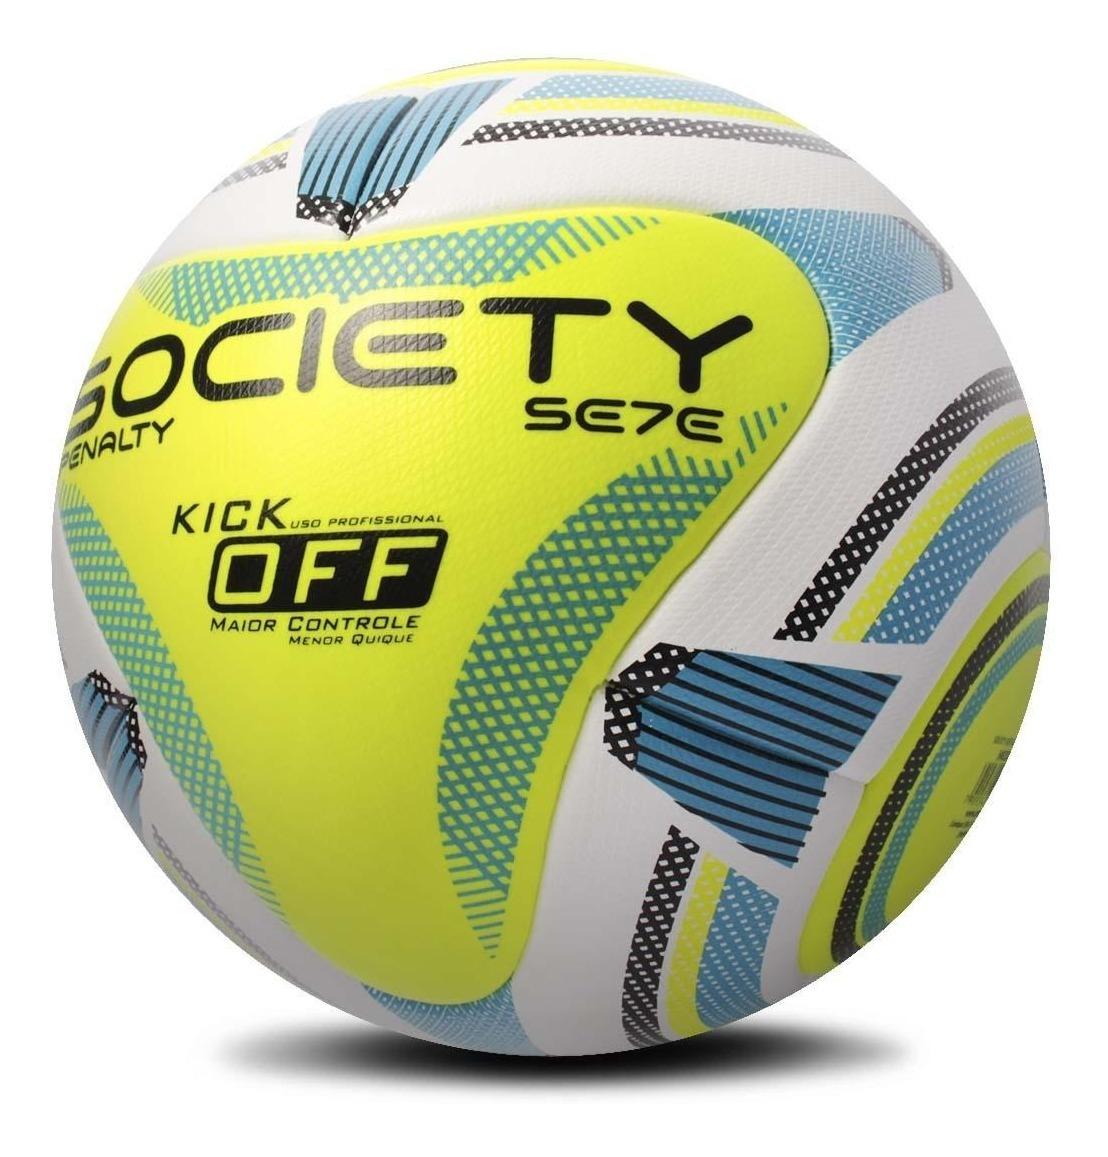 58e7a29dda Bola Society Penalty Sete R2 Kick Off Ix - R$ 155,90 em Mercado Livre